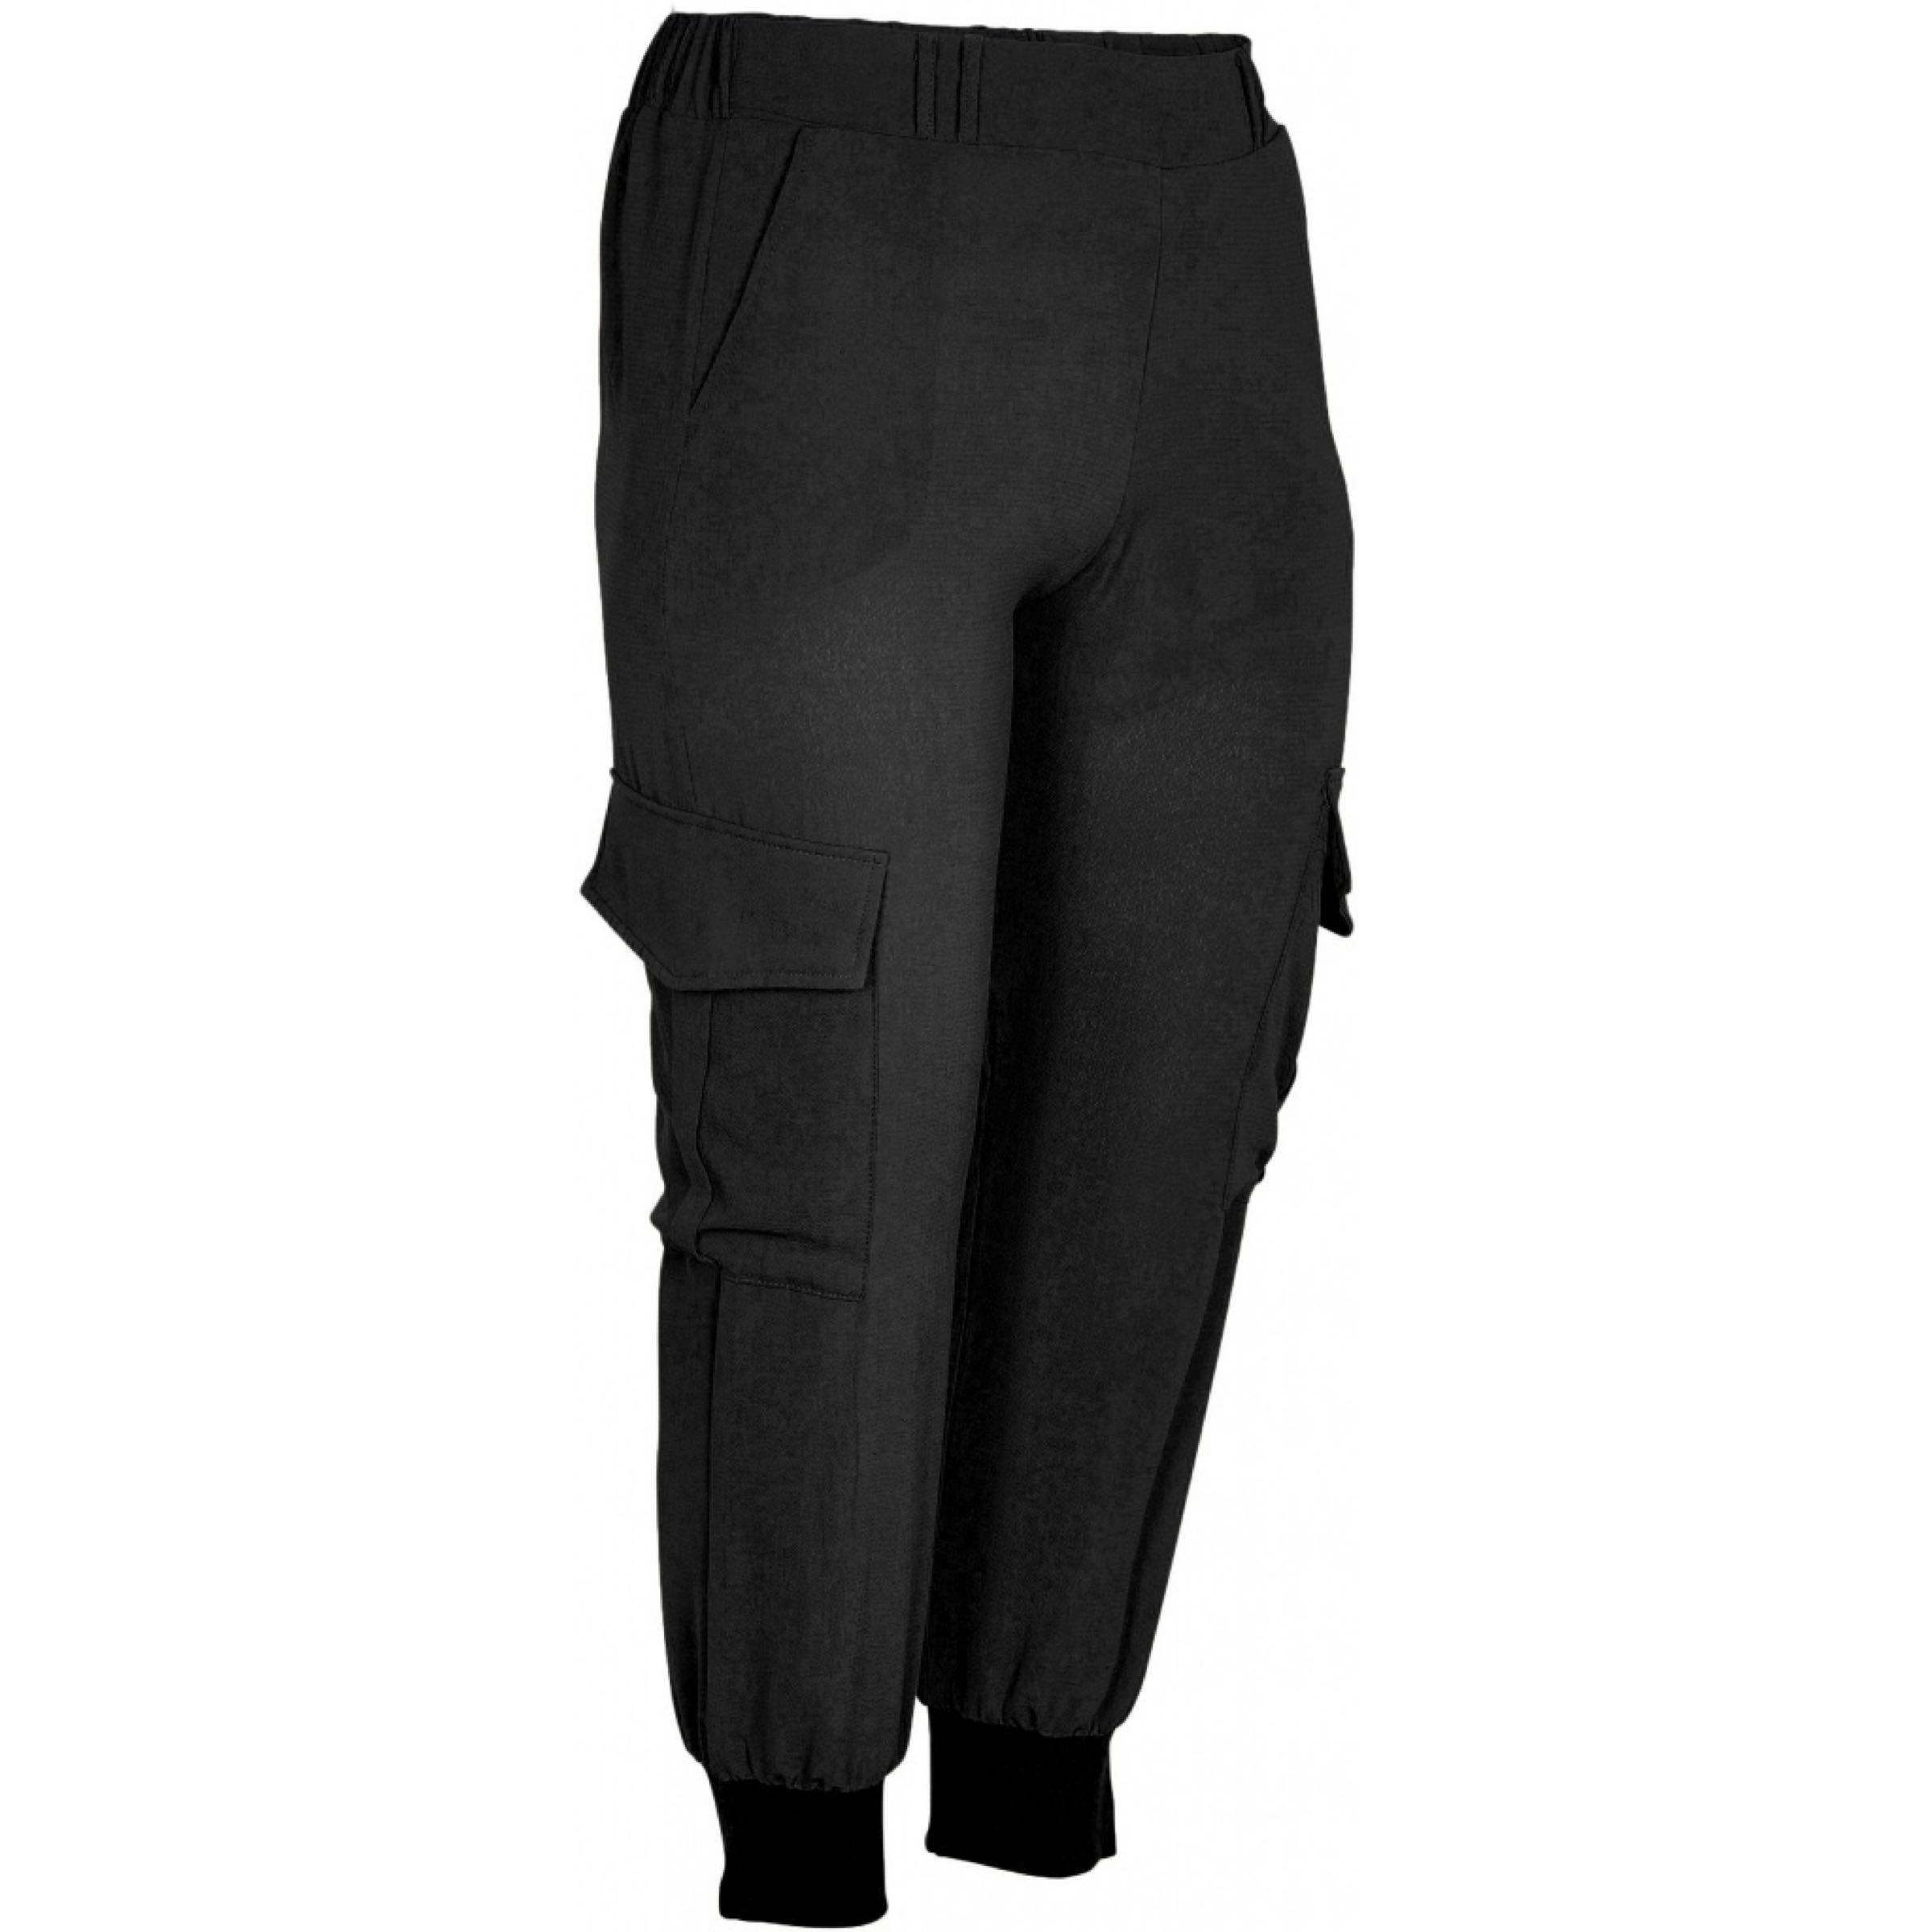 Alexis pants